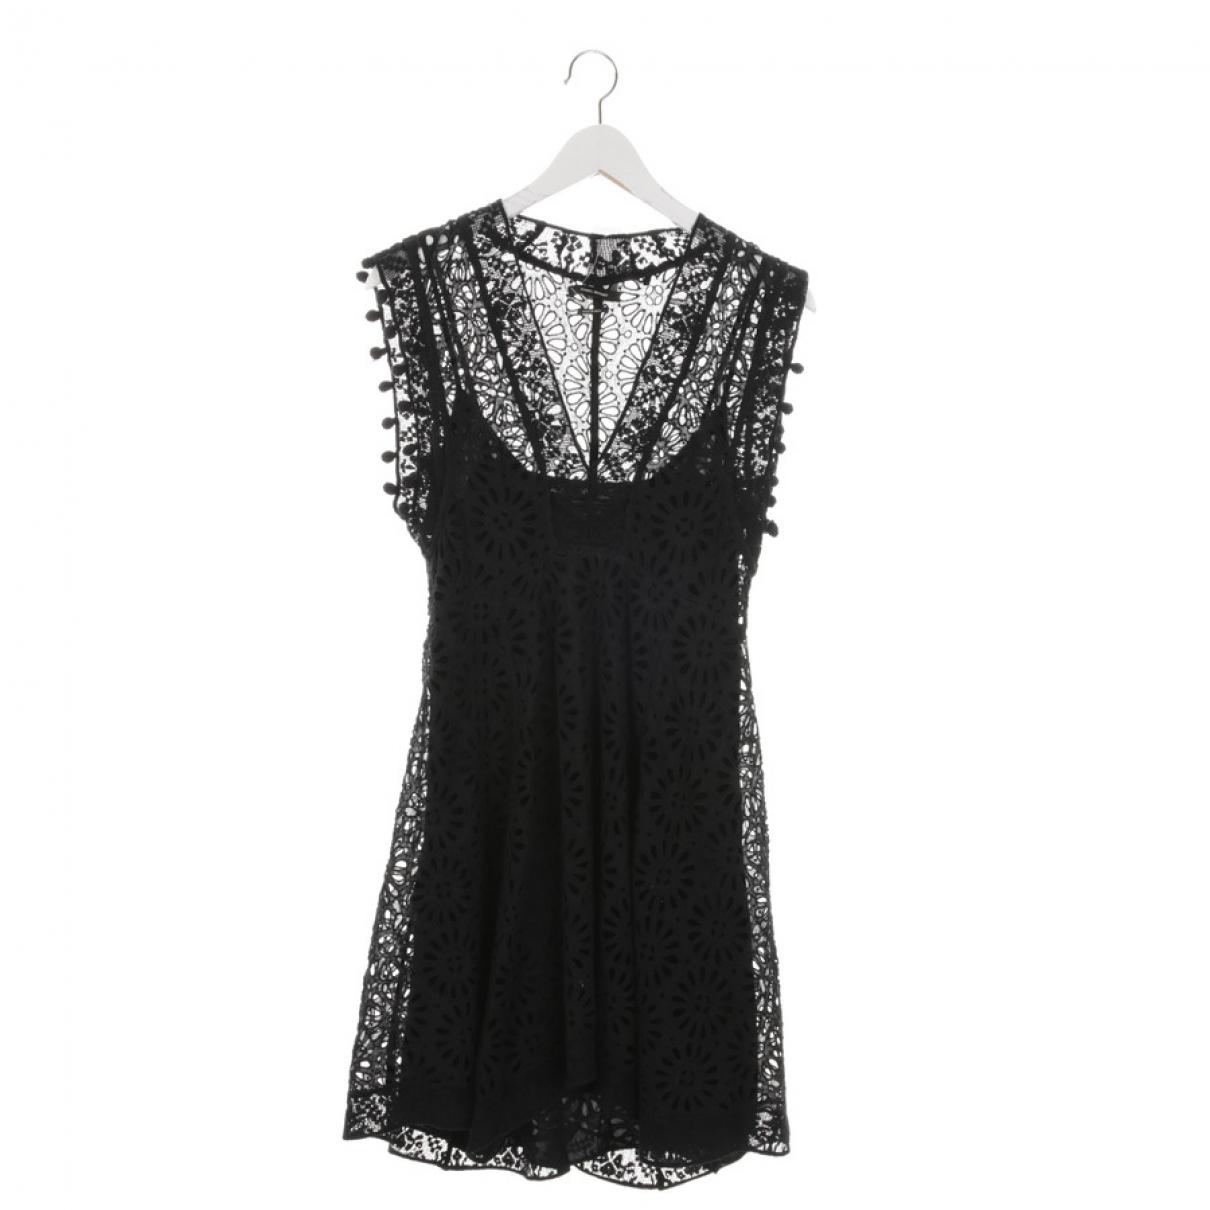 Isabel Marant \N Black dress for Women 34 FR